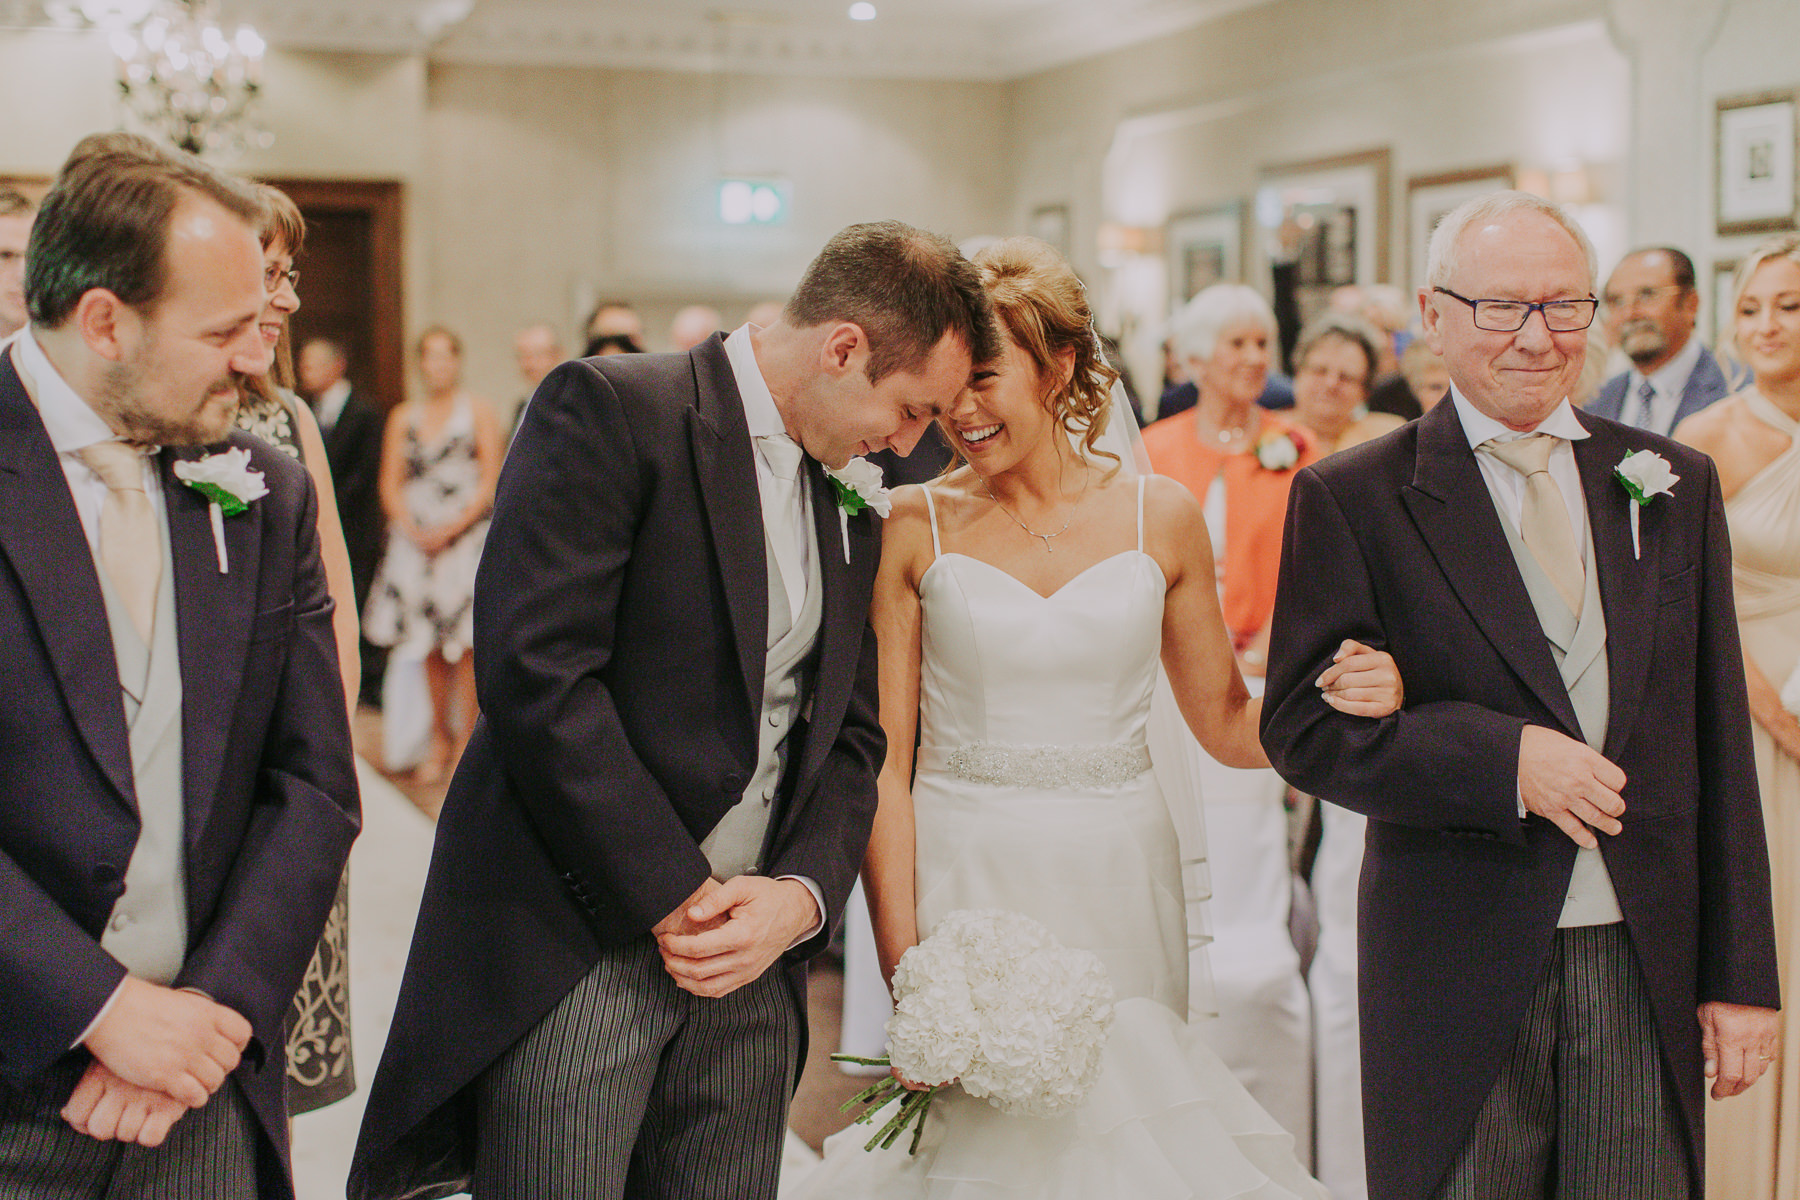 Meg & Jon | Wood Hall Hotel Wedding 321